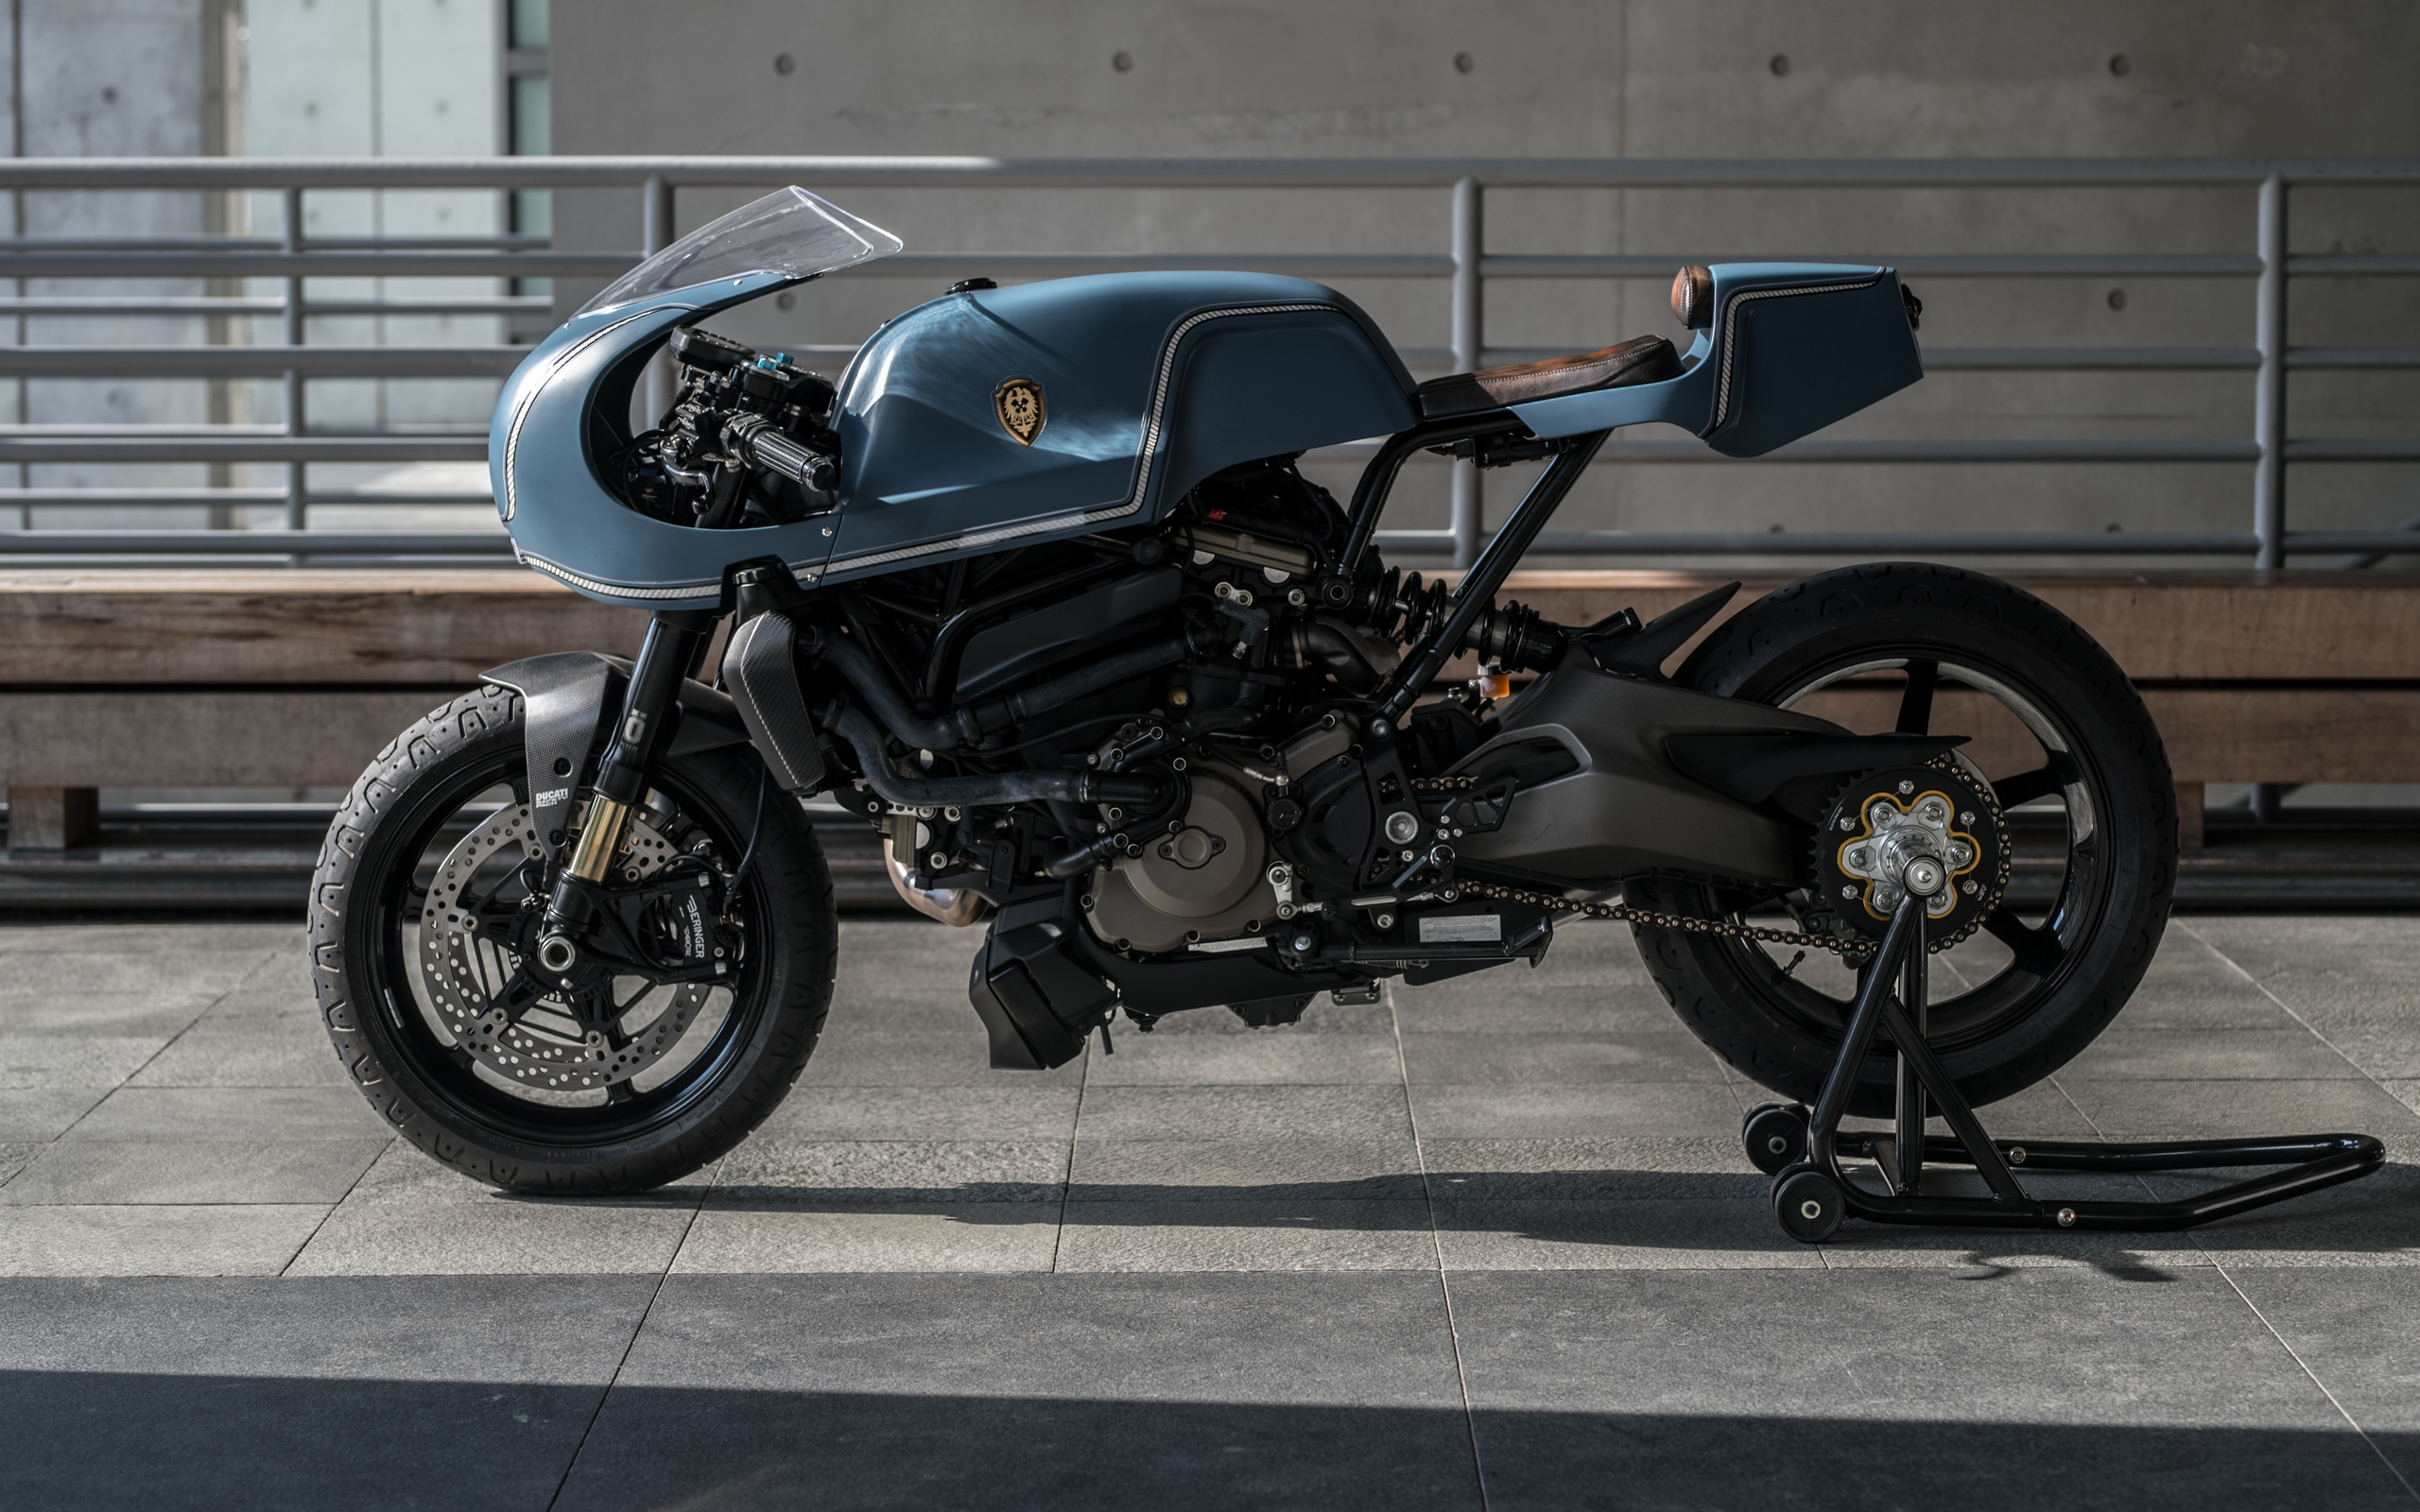 мотоцикл, ducati, monstro, cafe racer